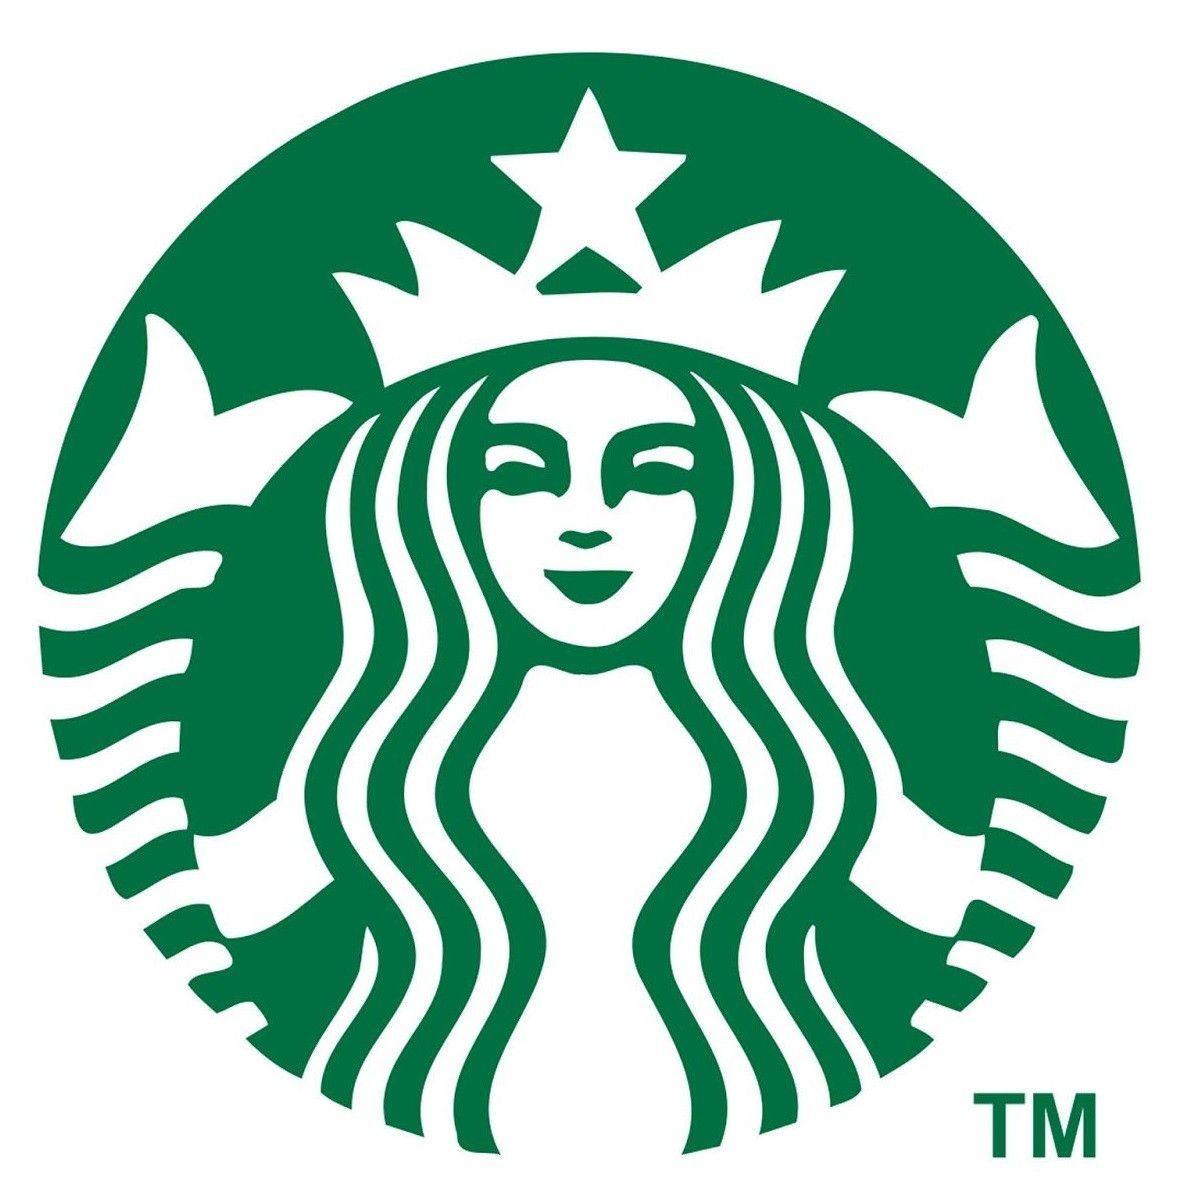 photograph relating to Starbucks Logo Printable known as Medium Printable Starbucks Brand - LogoDix